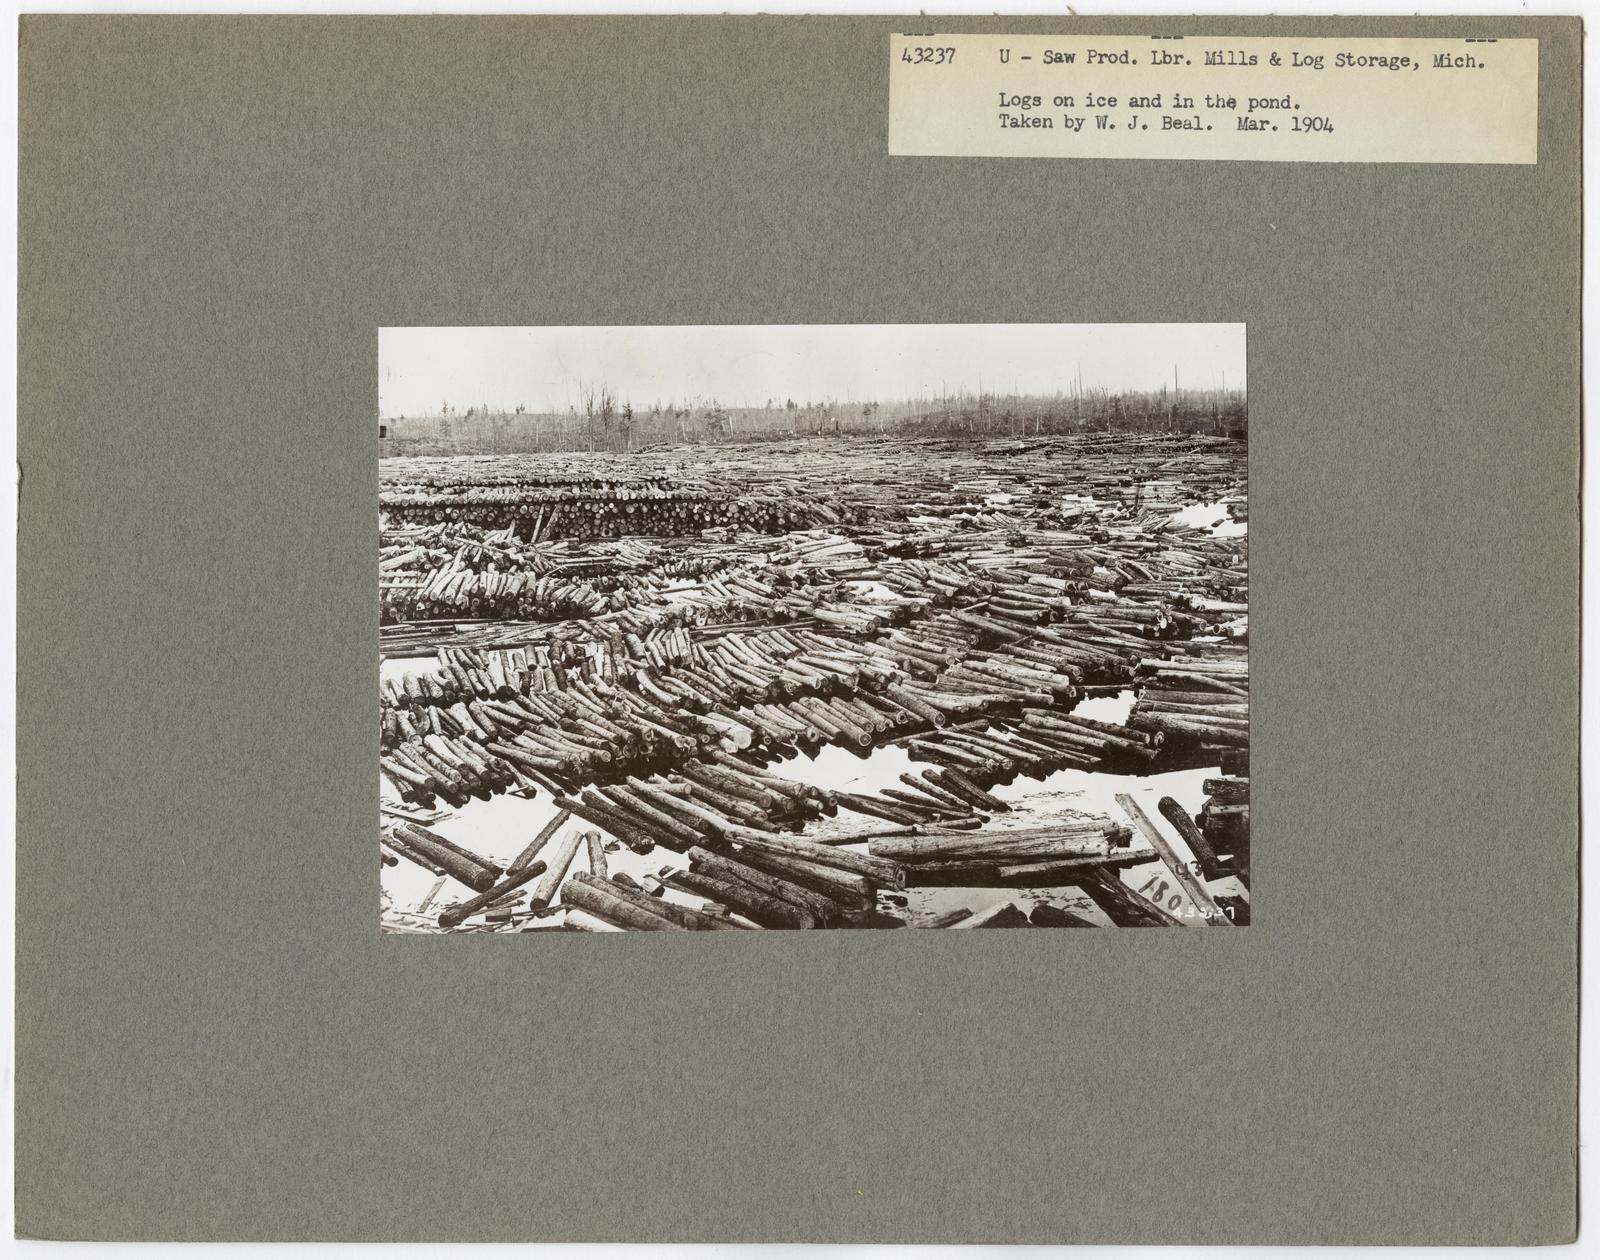 Mills, Milling and Log Storage - Michigan